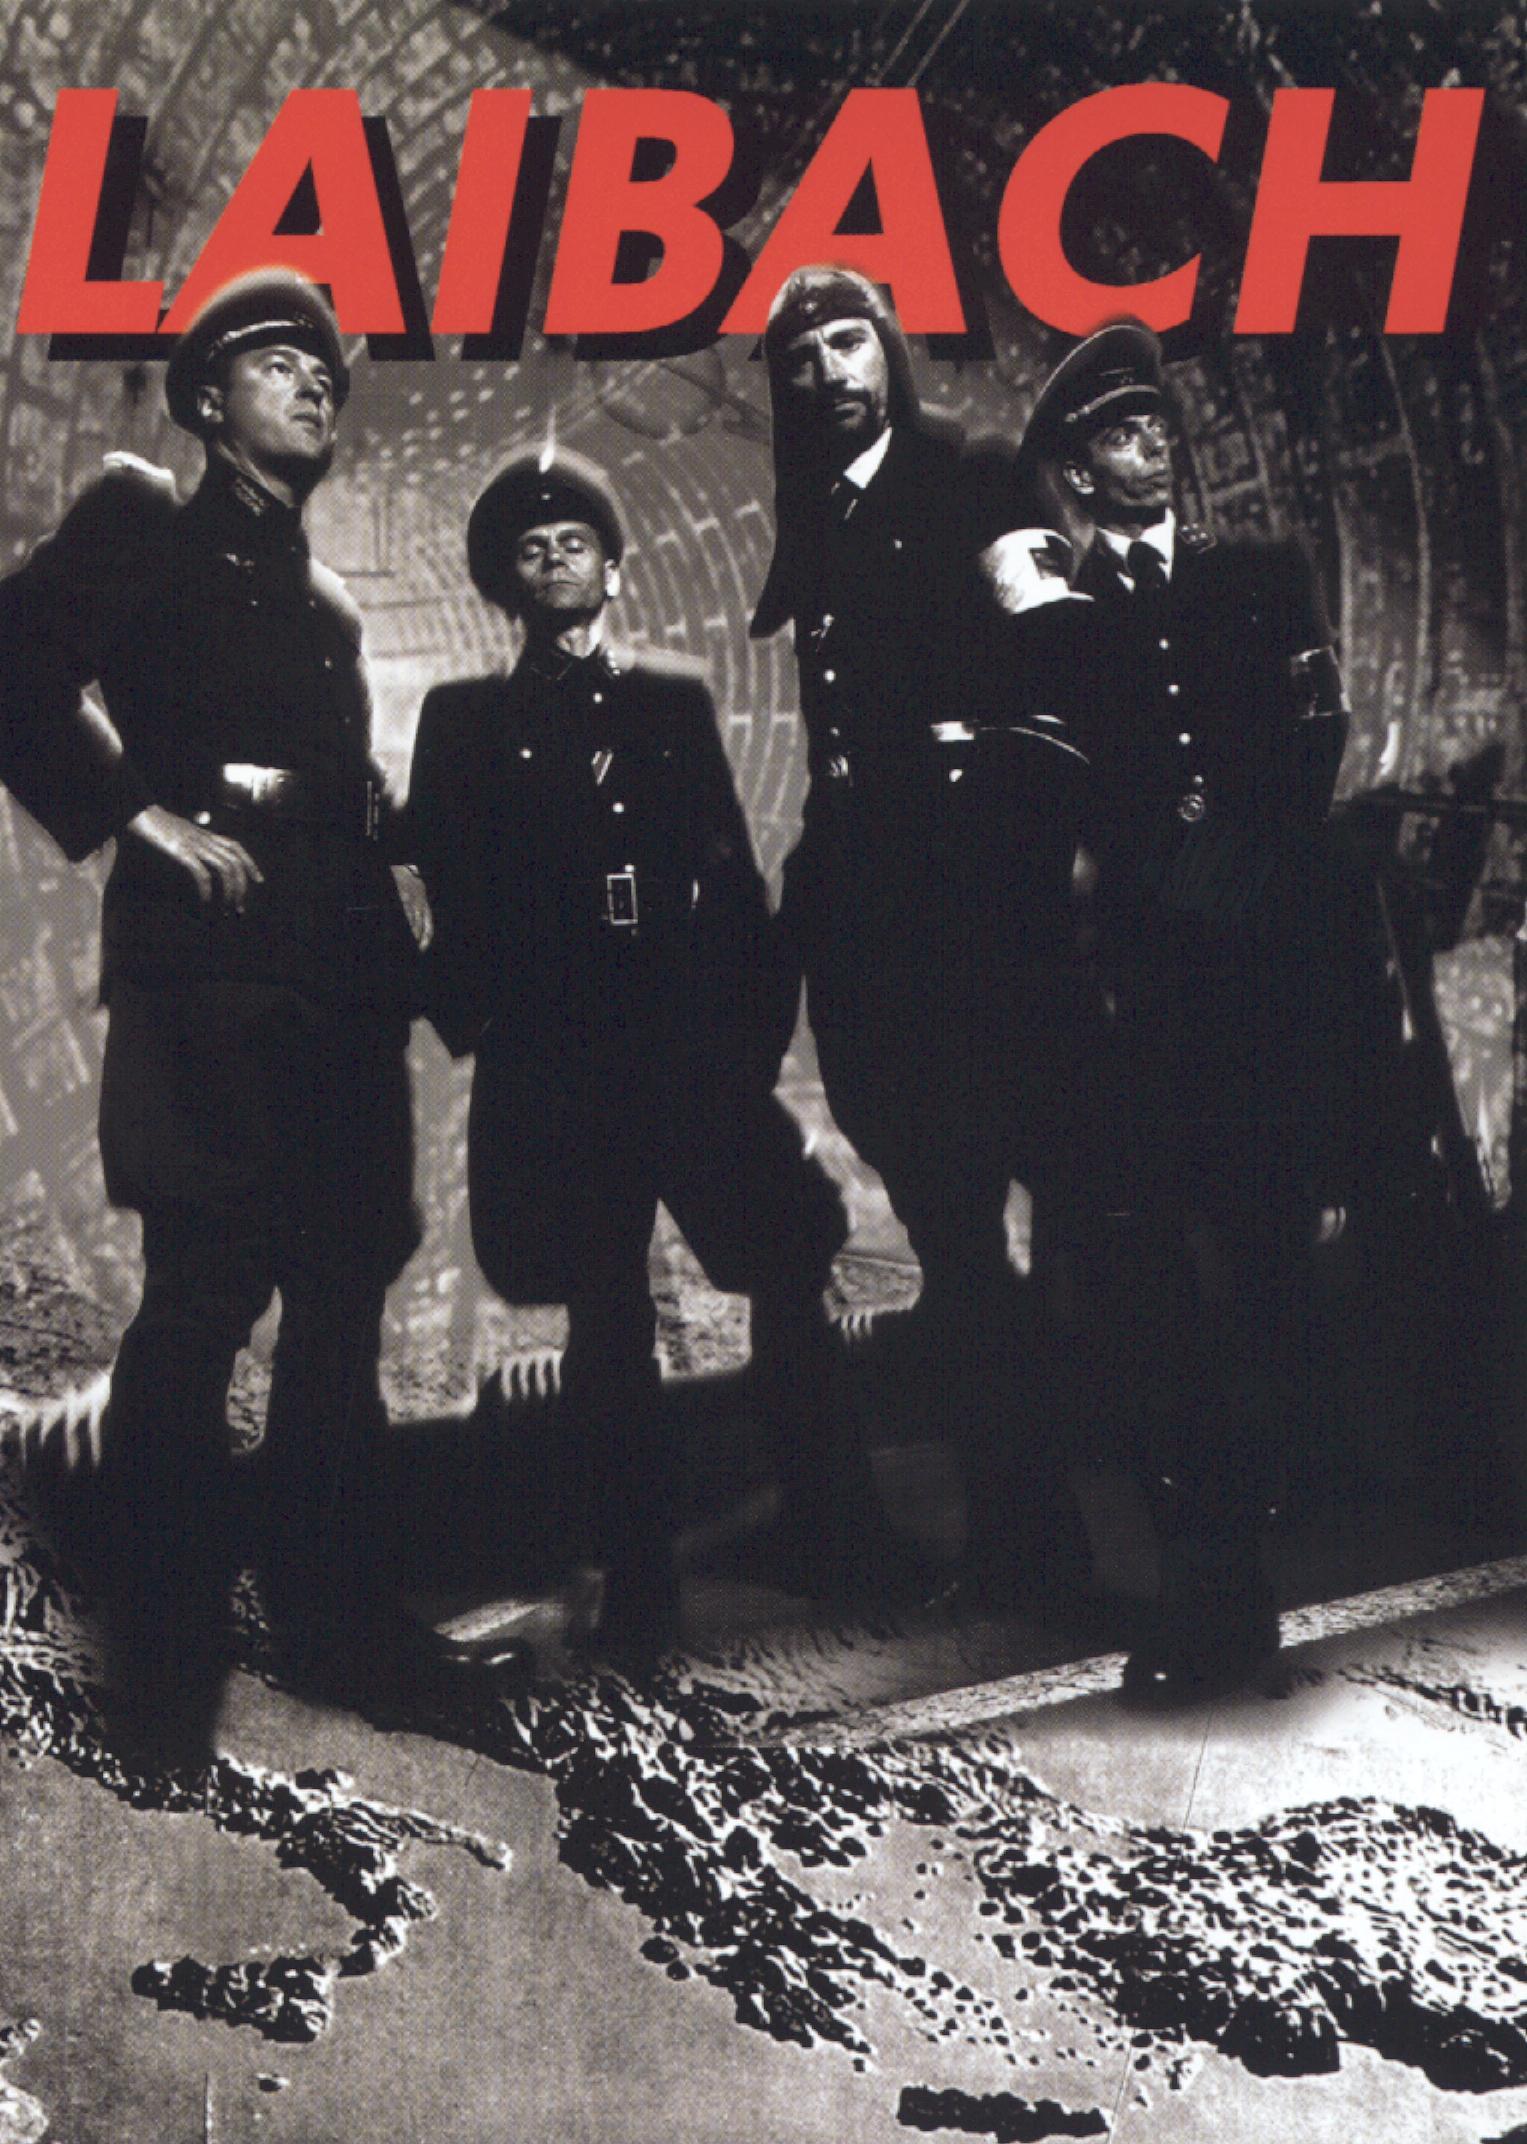 Laibach: Videos